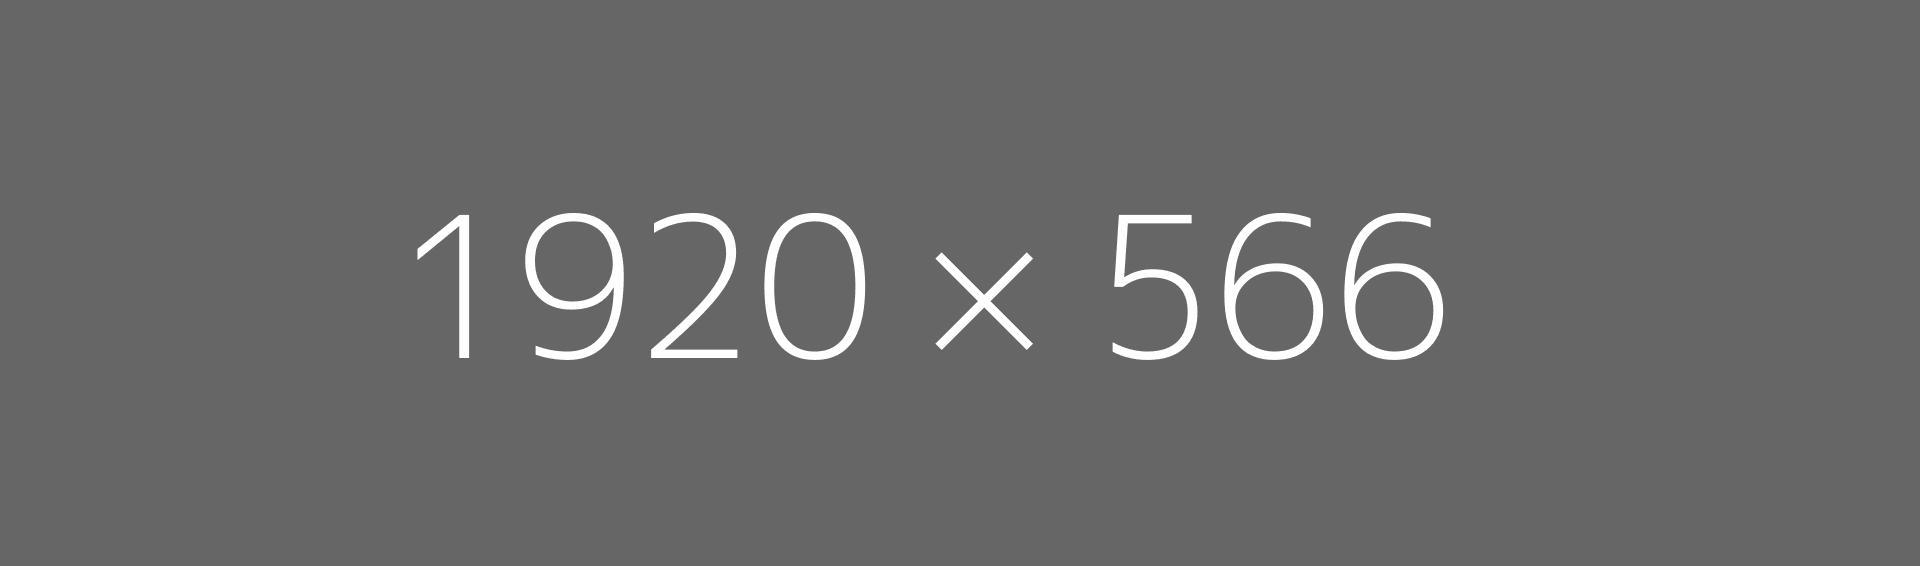 1920x566